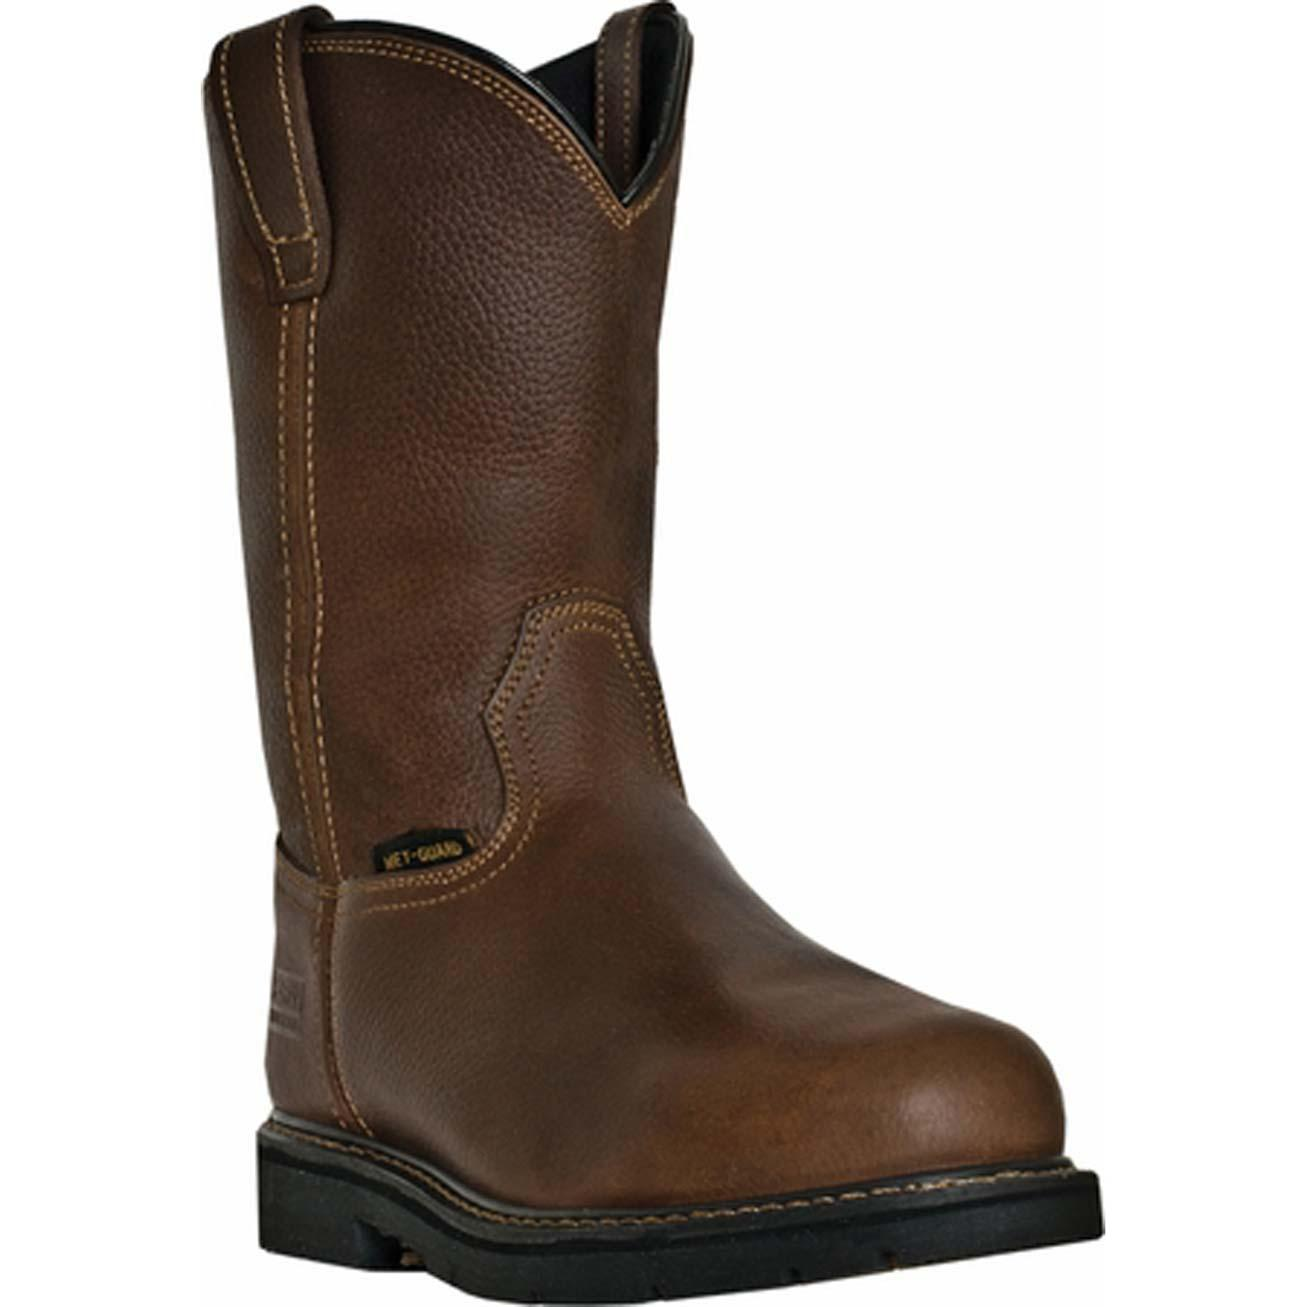 c145745054e McRae Industrial Steel Toe Internal MetGuard Work Pull-On Boot